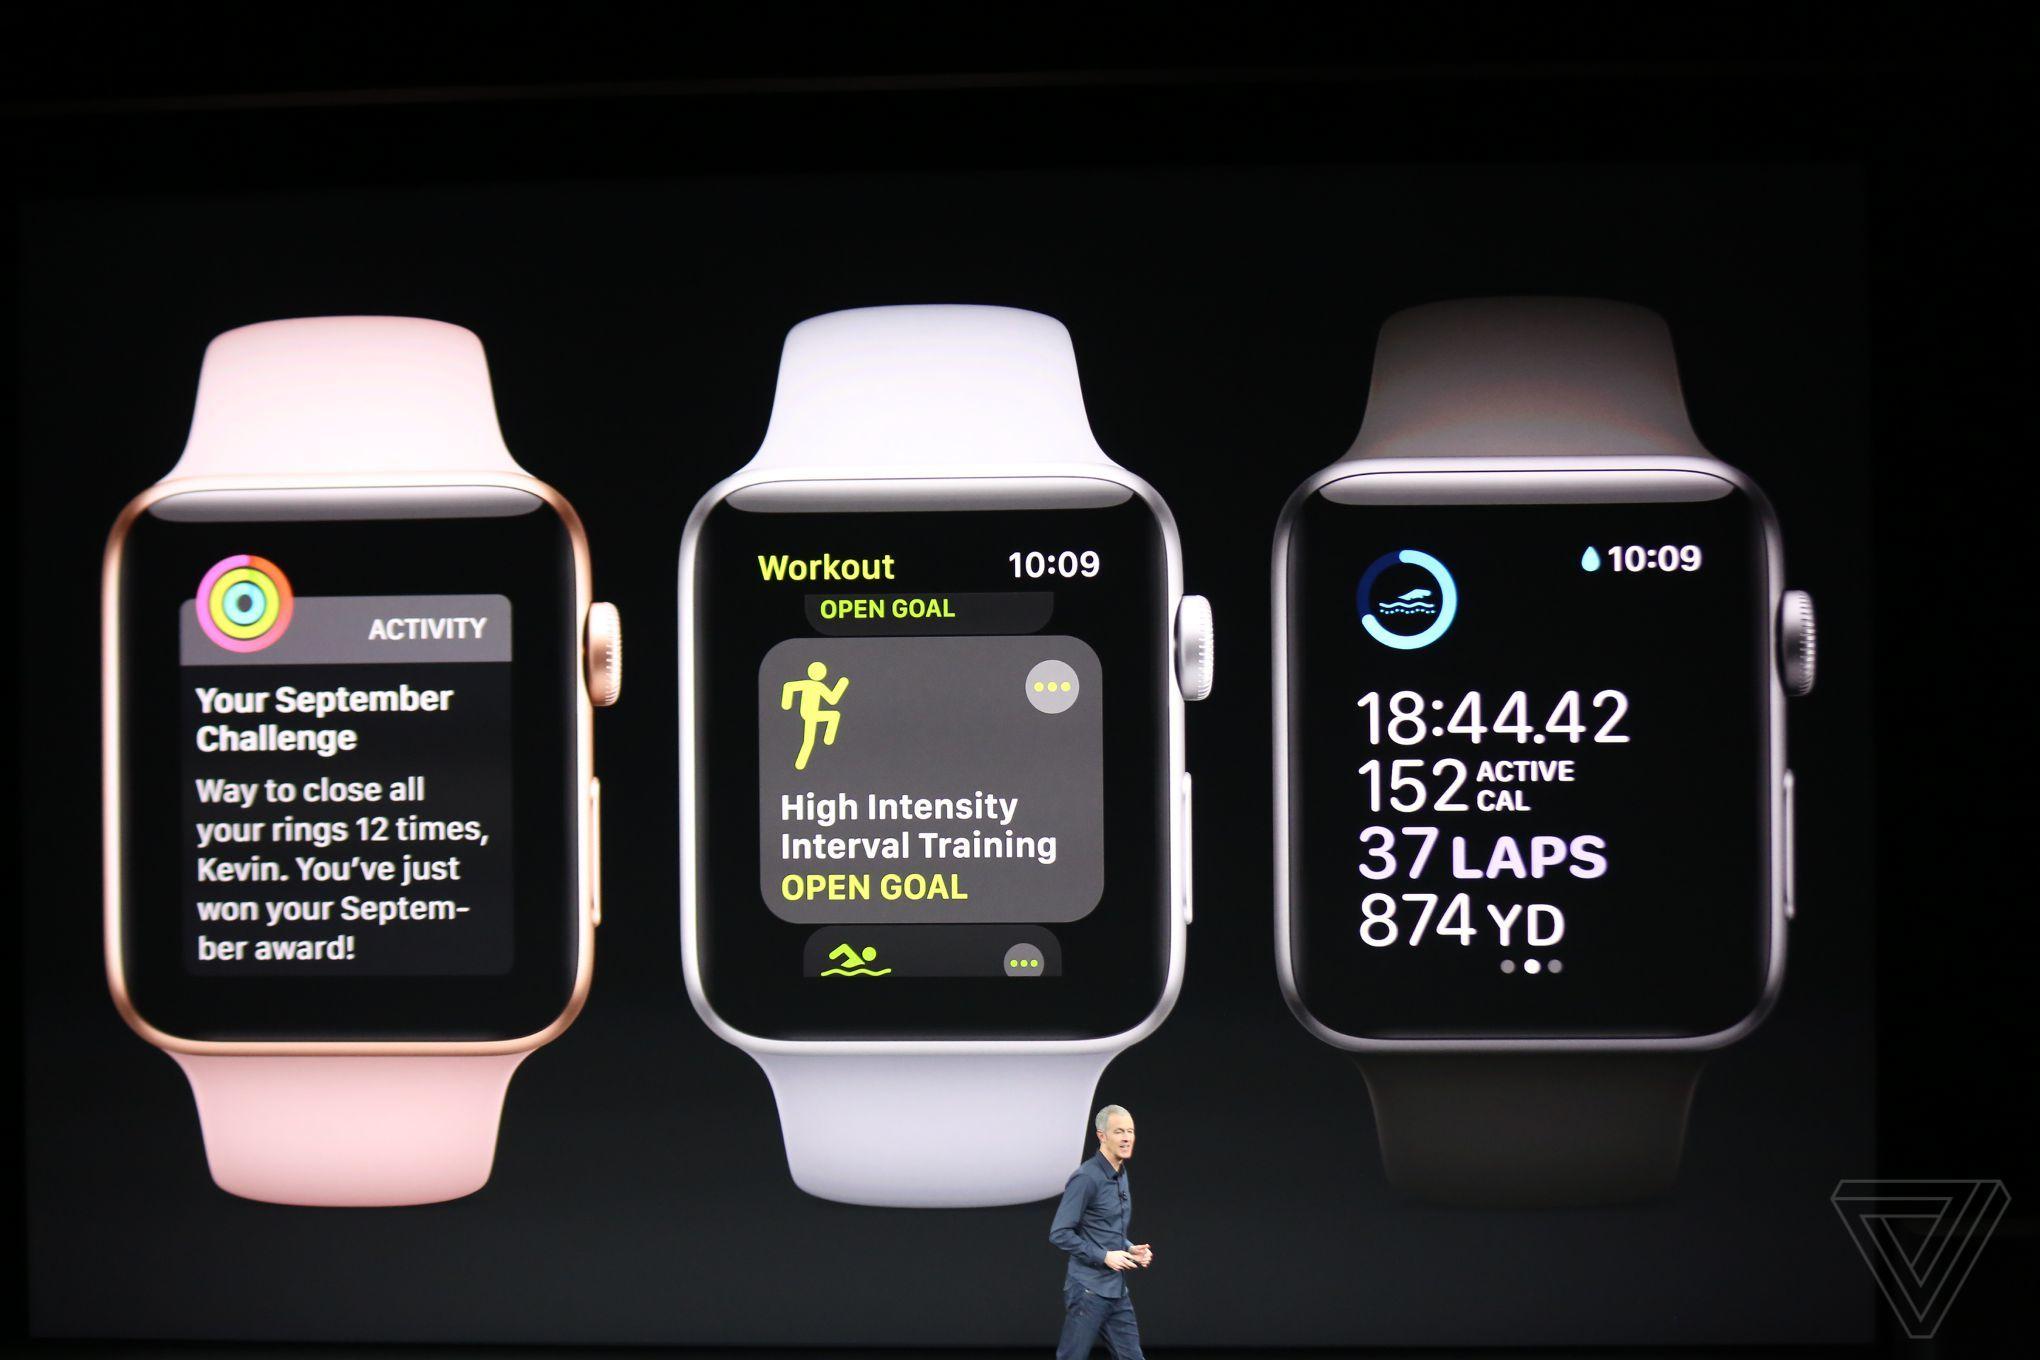 Apple Watch 3 New Apple Watch 3 Series